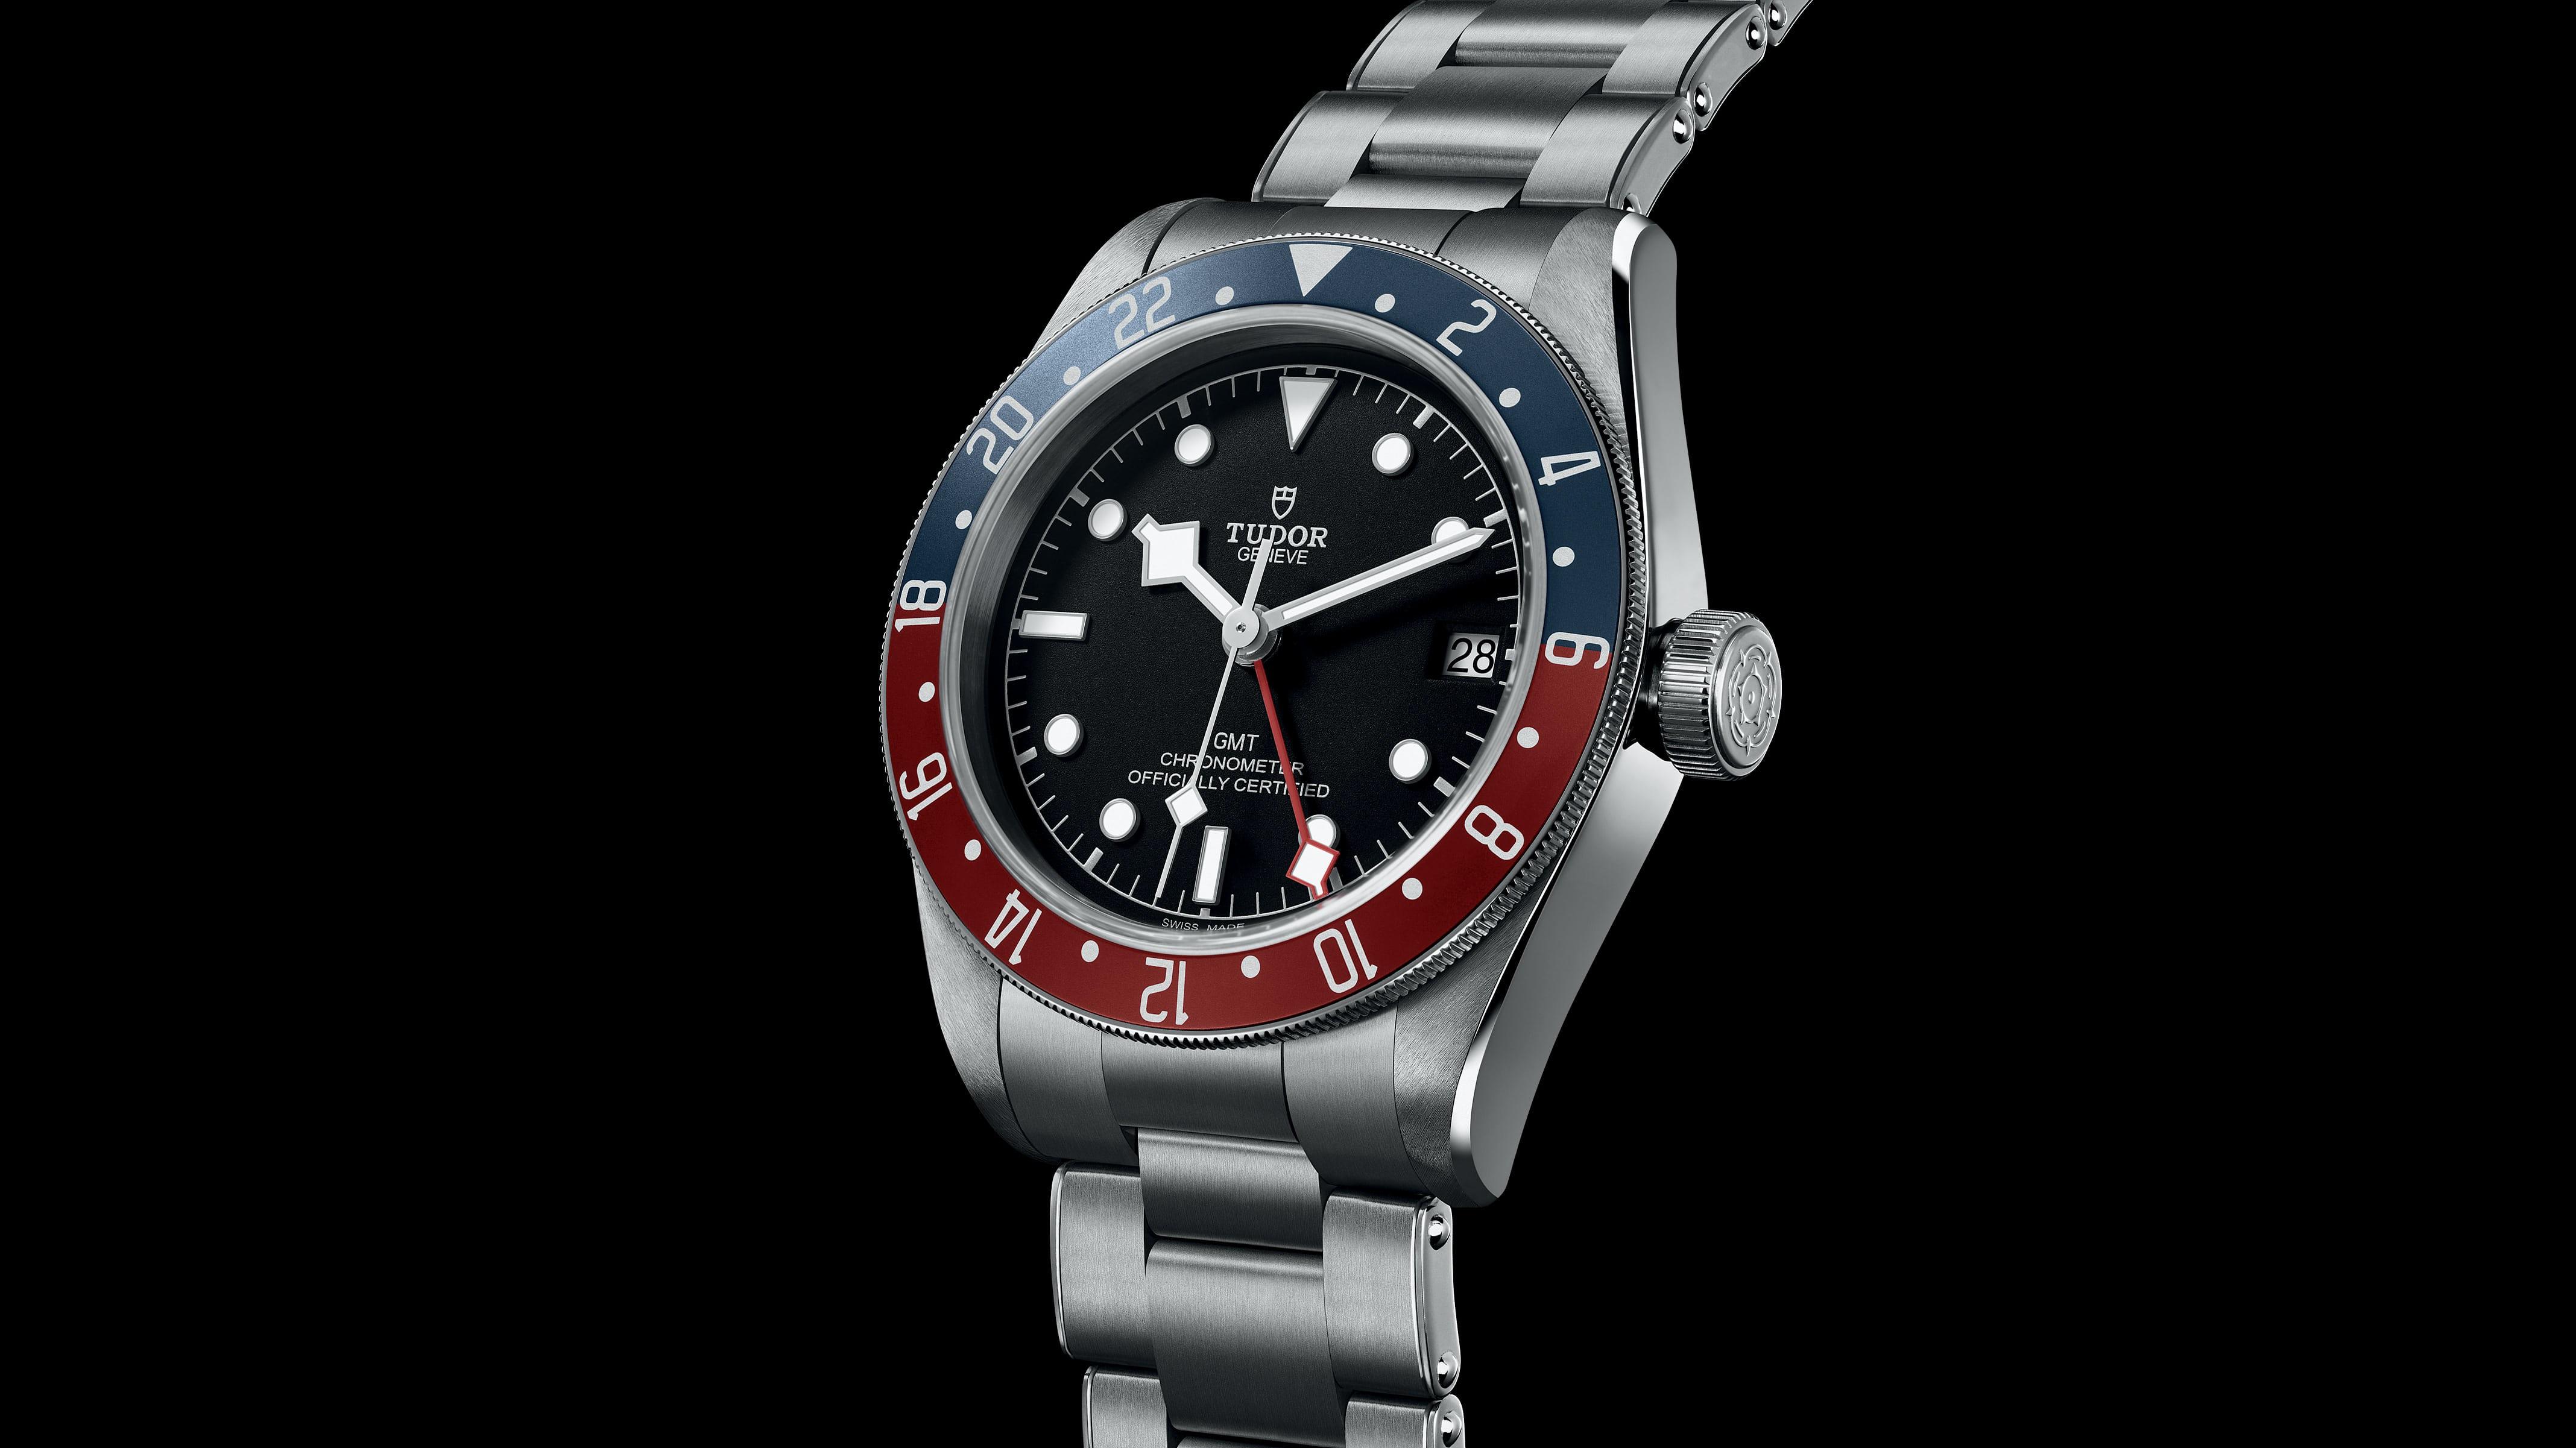 43514659db8 Introducing: The Tudor Black Bay GMT - HODINKEE